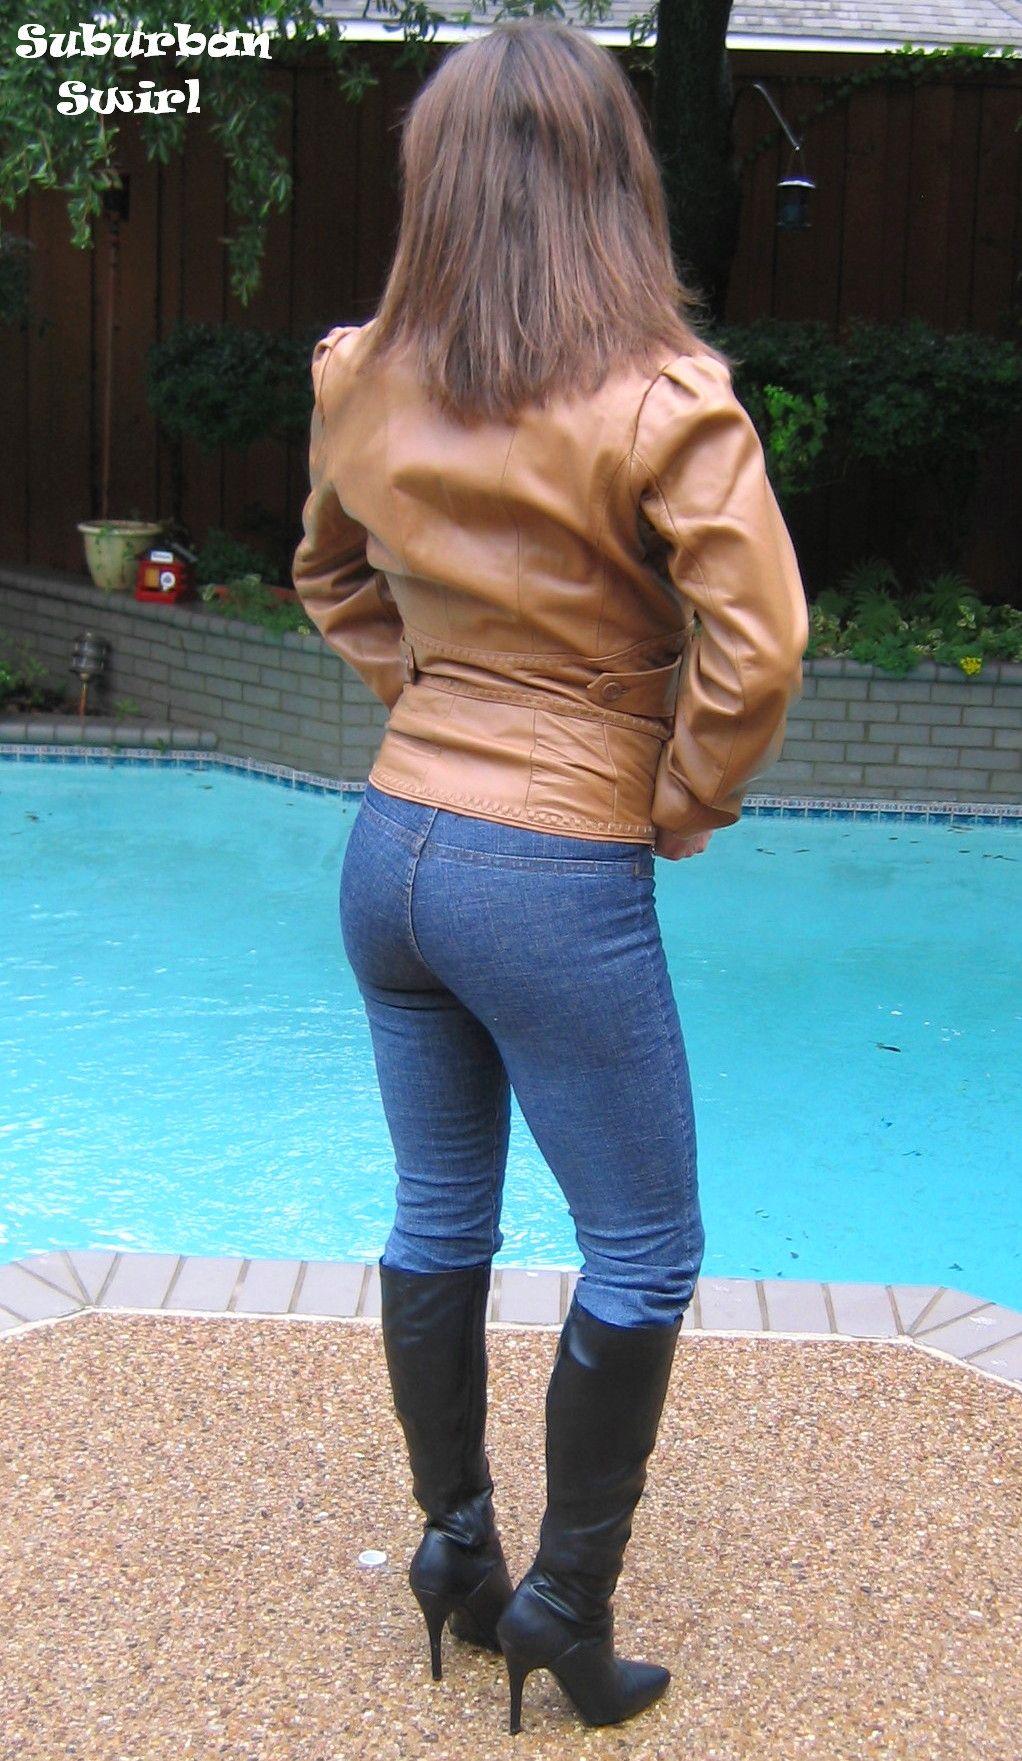 Pocketless Jean Shorts Suburban Swirl Jeans By Venus